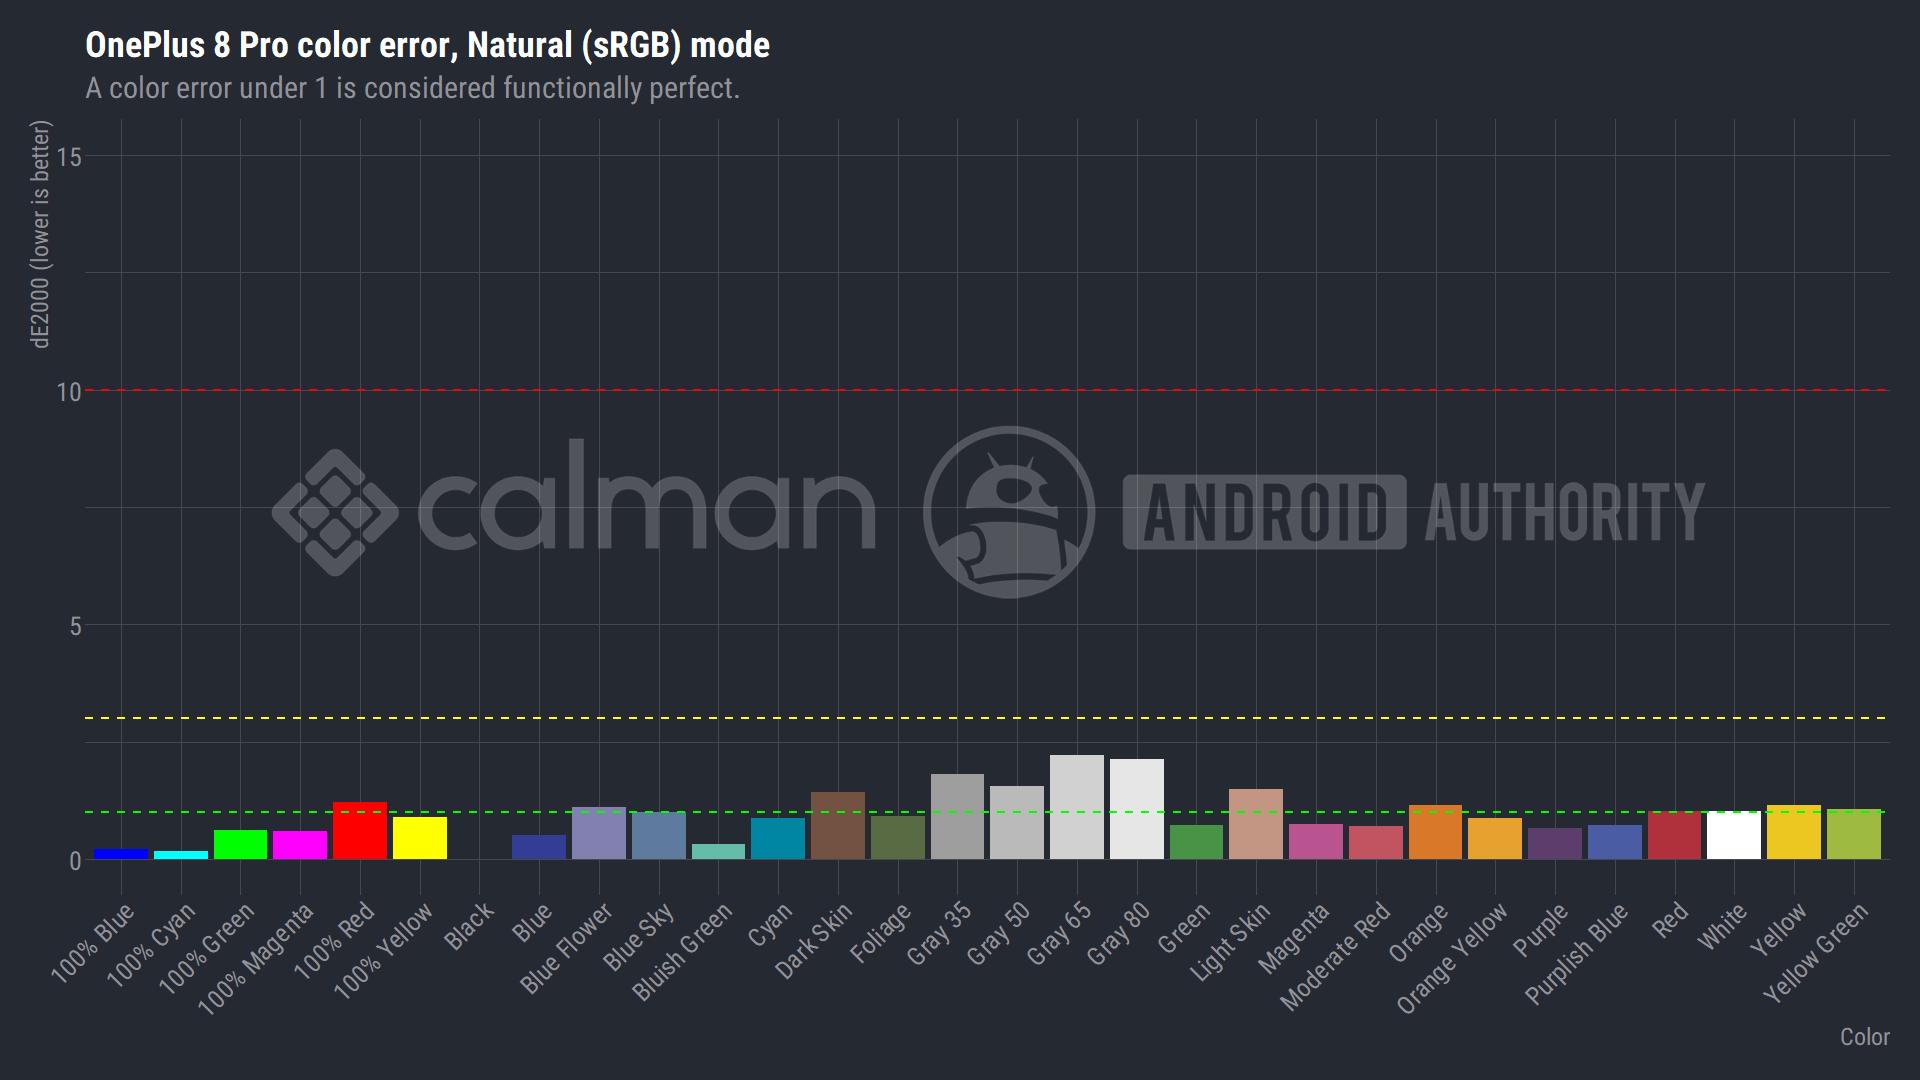 OnePlus 8 Pro Natural sRGB mode screen color error dE2000